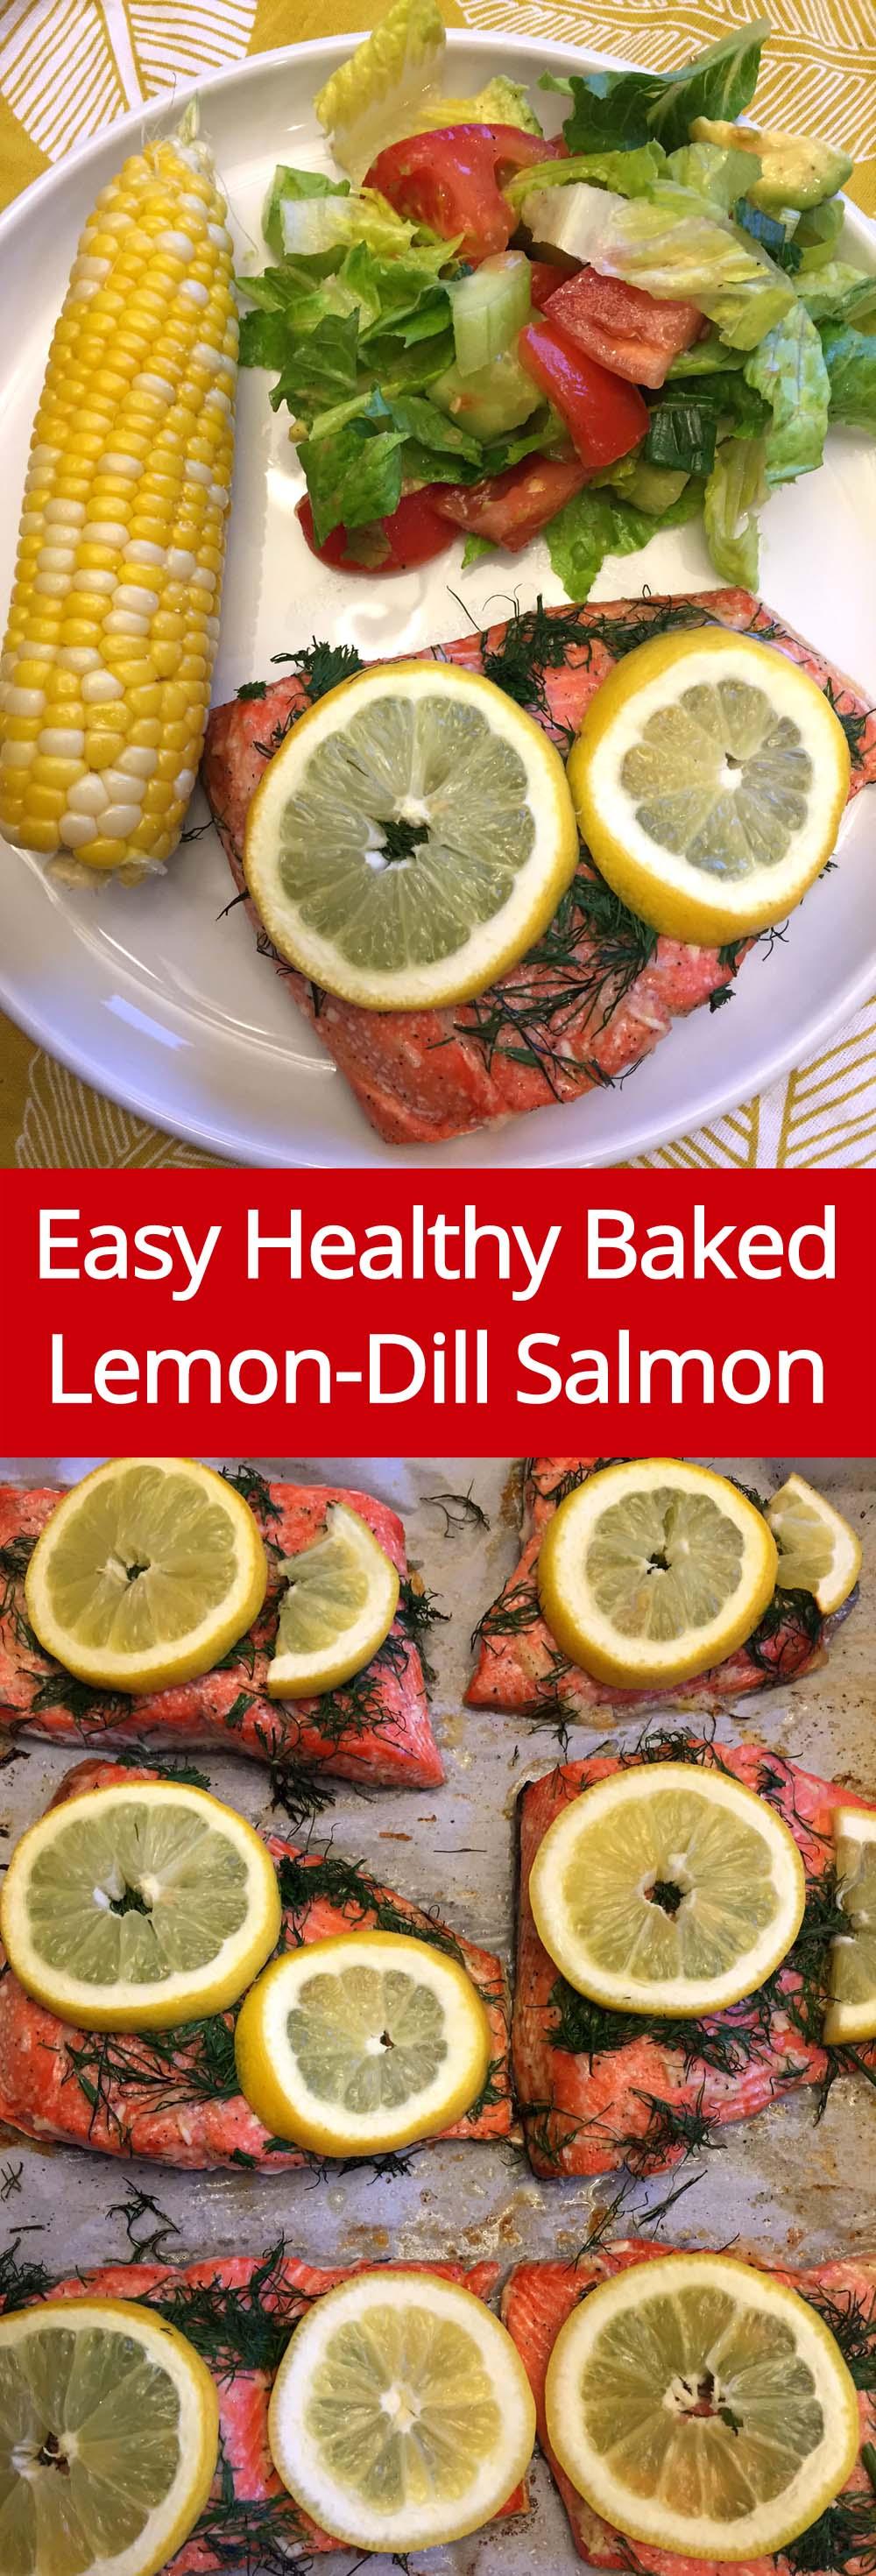 Easy & Healthy Baked Lemon-Dill Salmon - So Delicious!